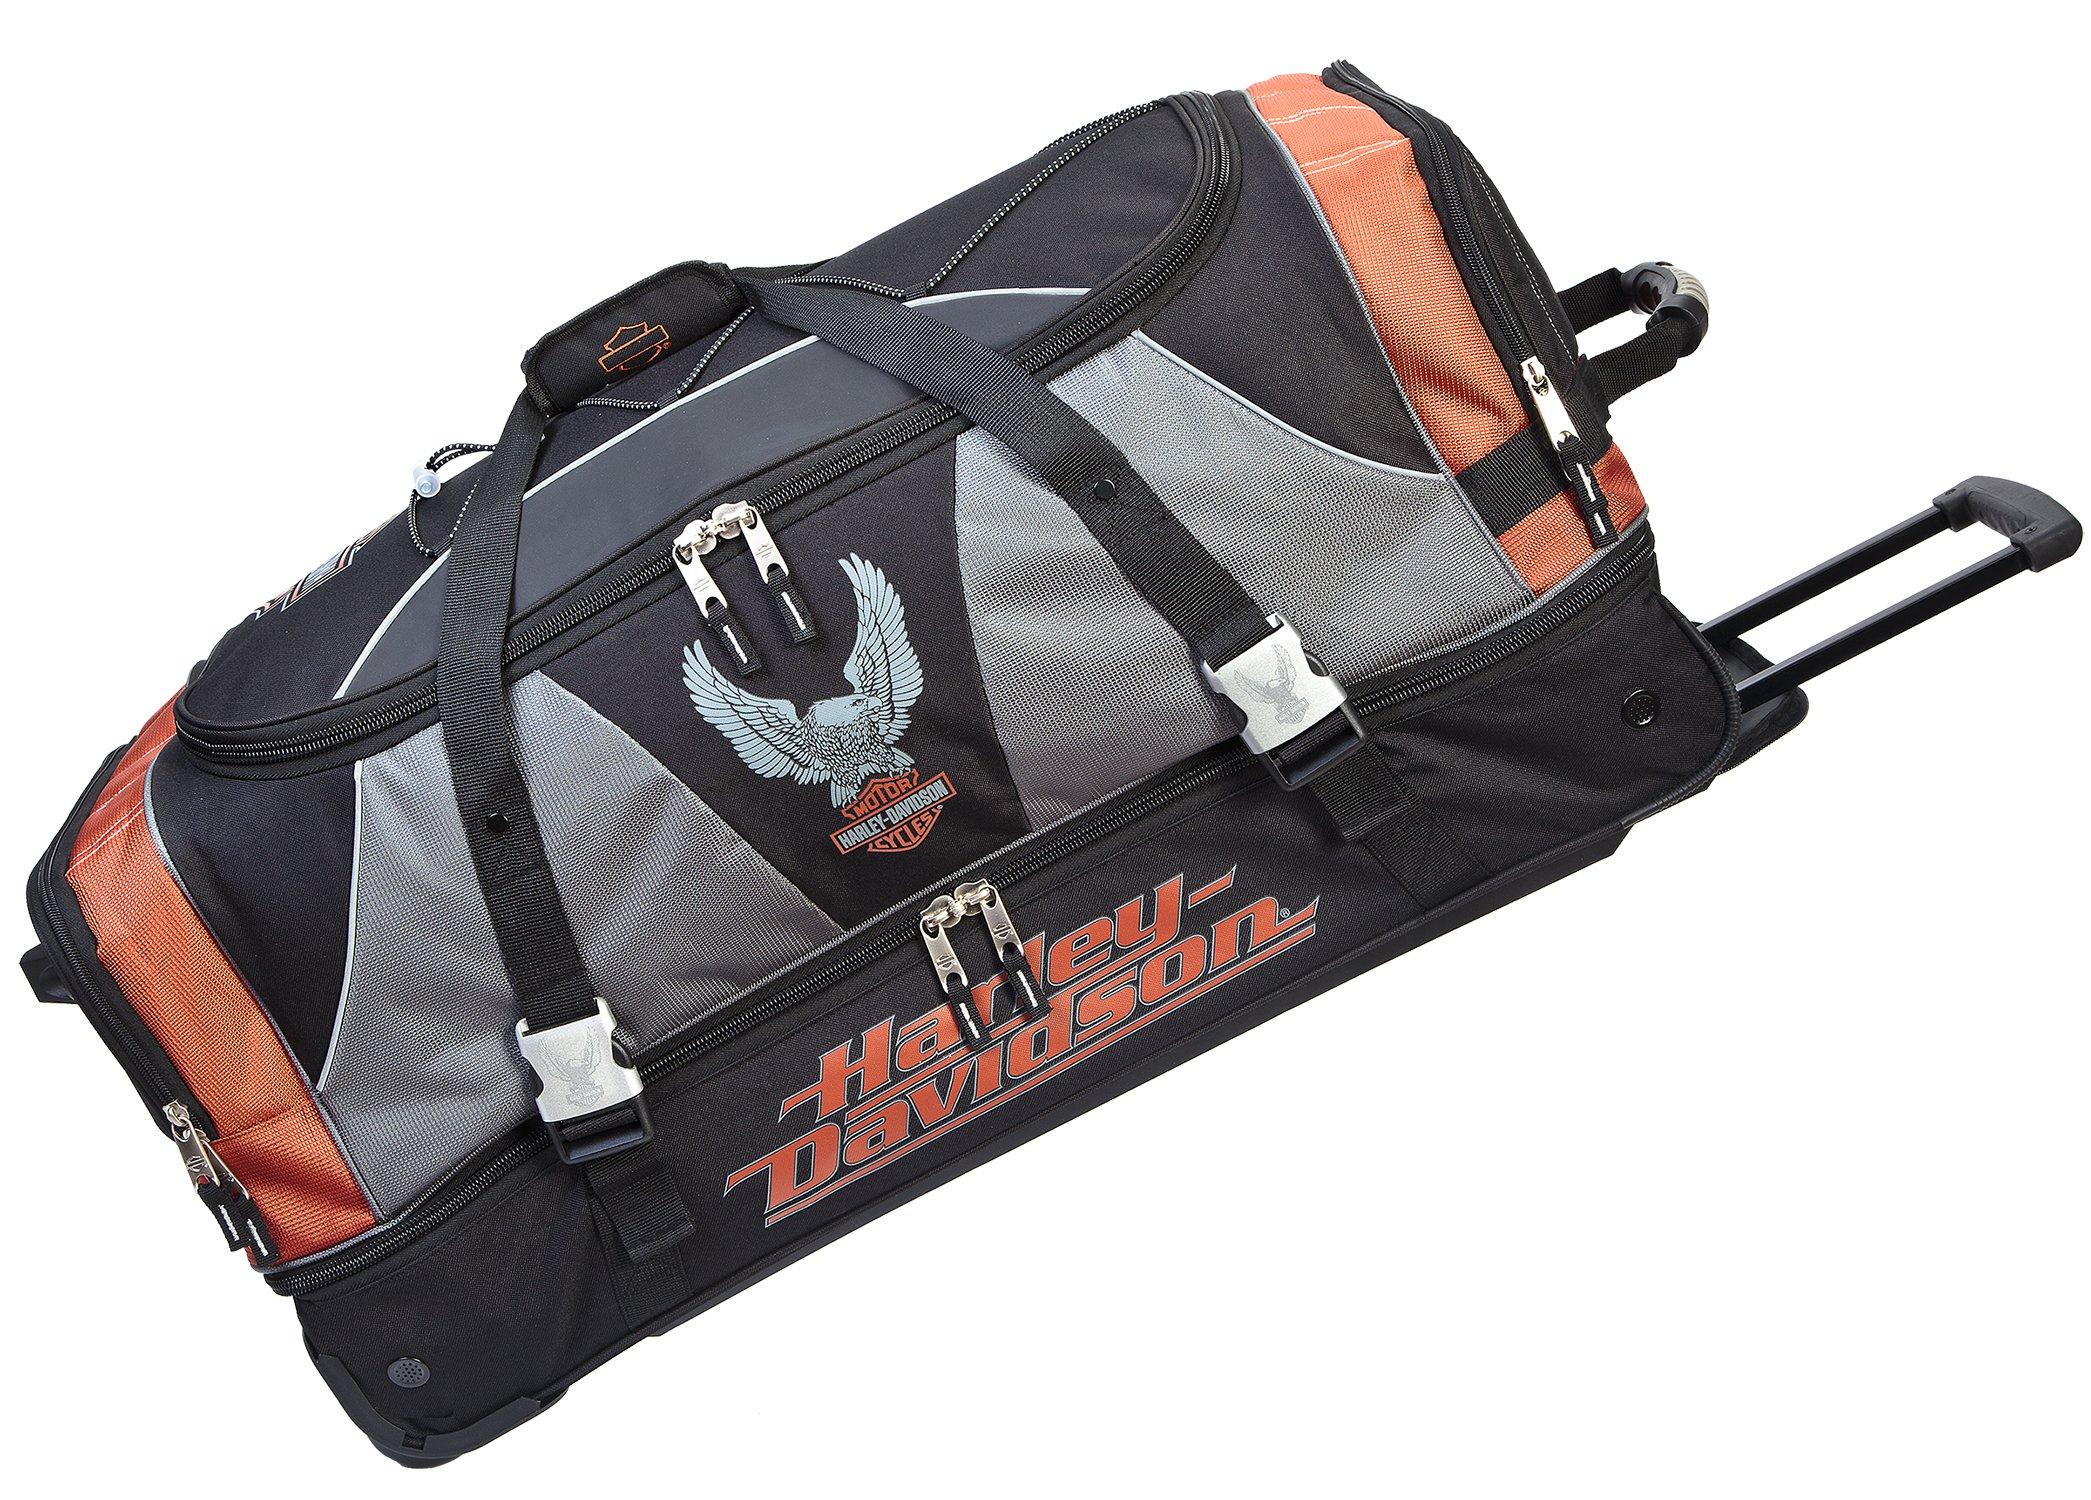 Harley Davidson 32 Inch X-Large Duffel with Organizer, Rust/Black, One Size